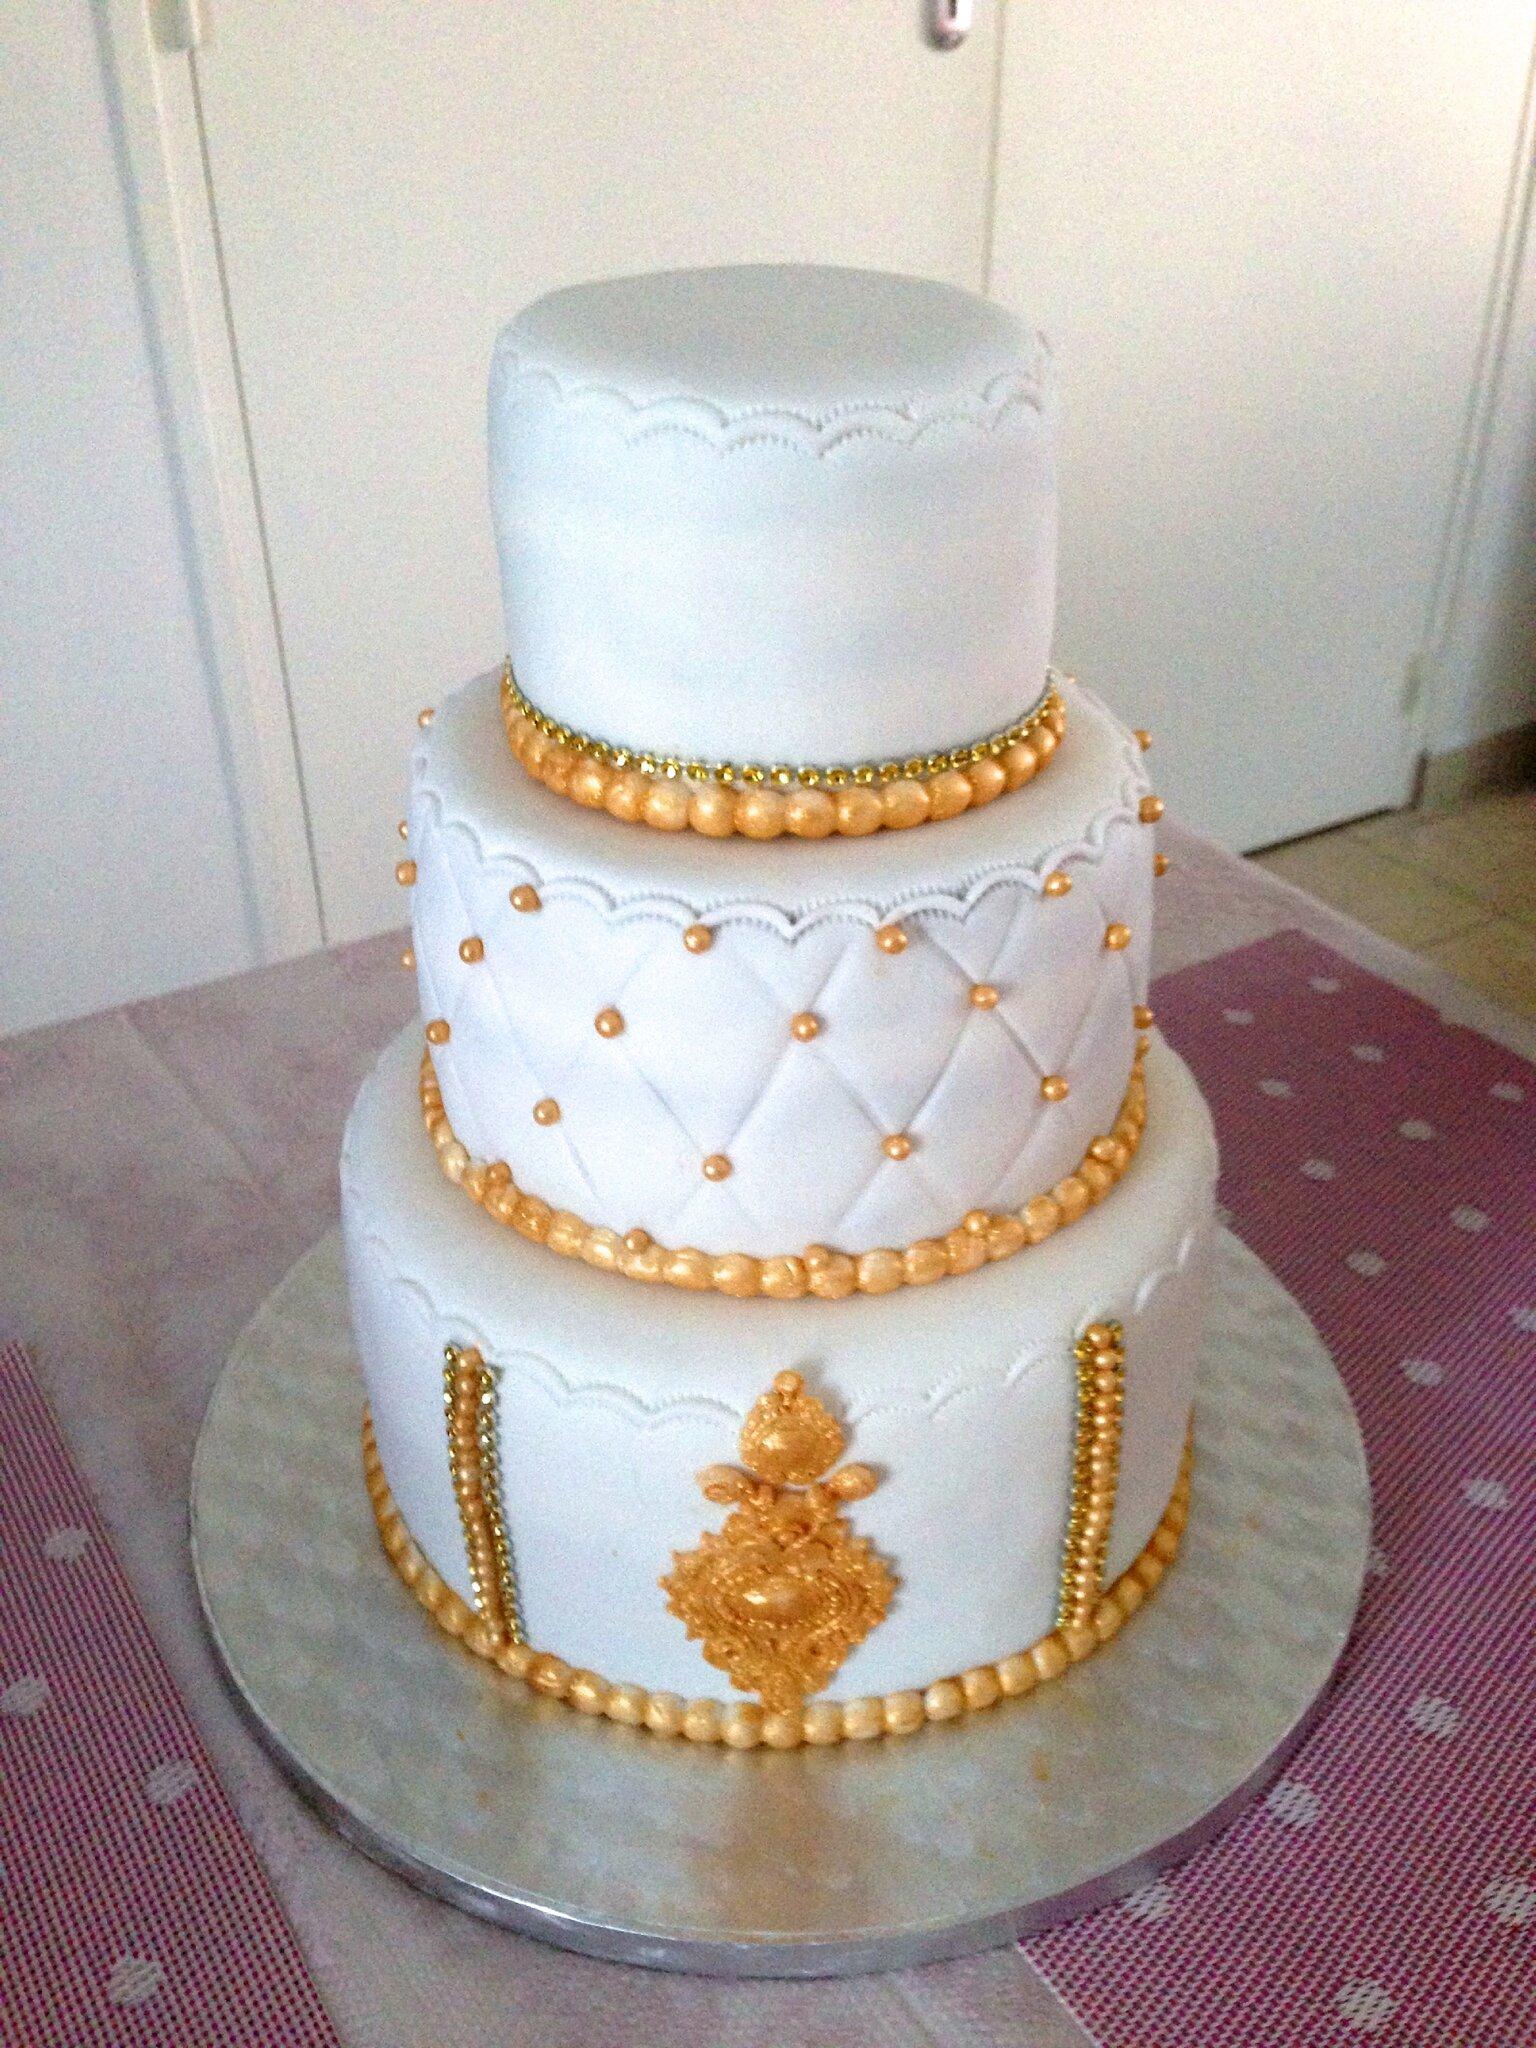 Wedding Cake Cake Concept Salon De Th Bagels